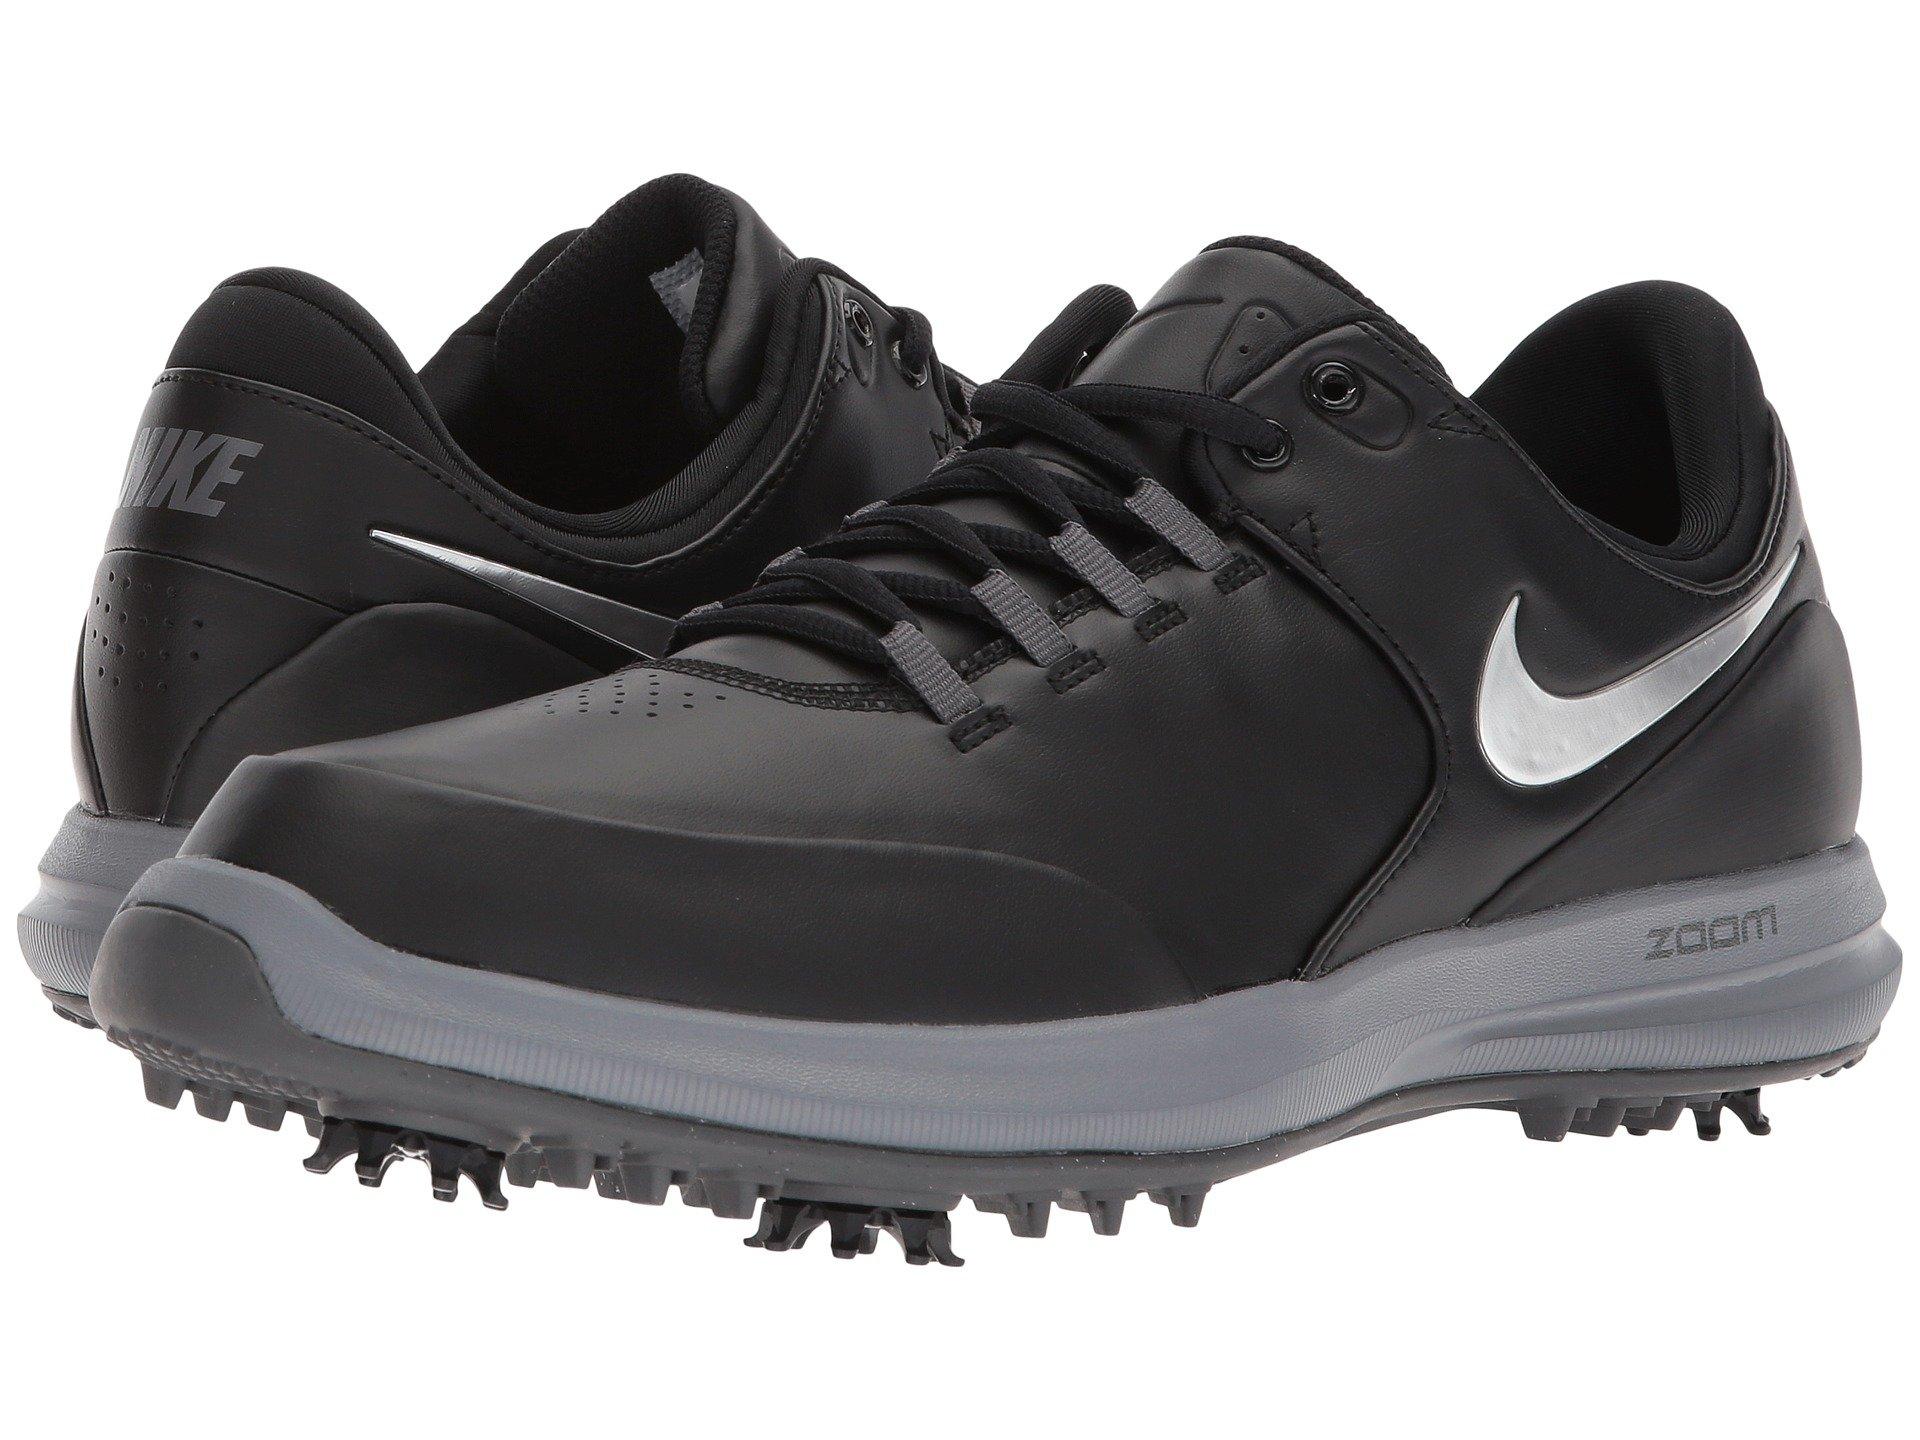 38190a00aa91 Nike Golf. Roshe G Tour.  110.00. Black Metallic Silver Cool Grey